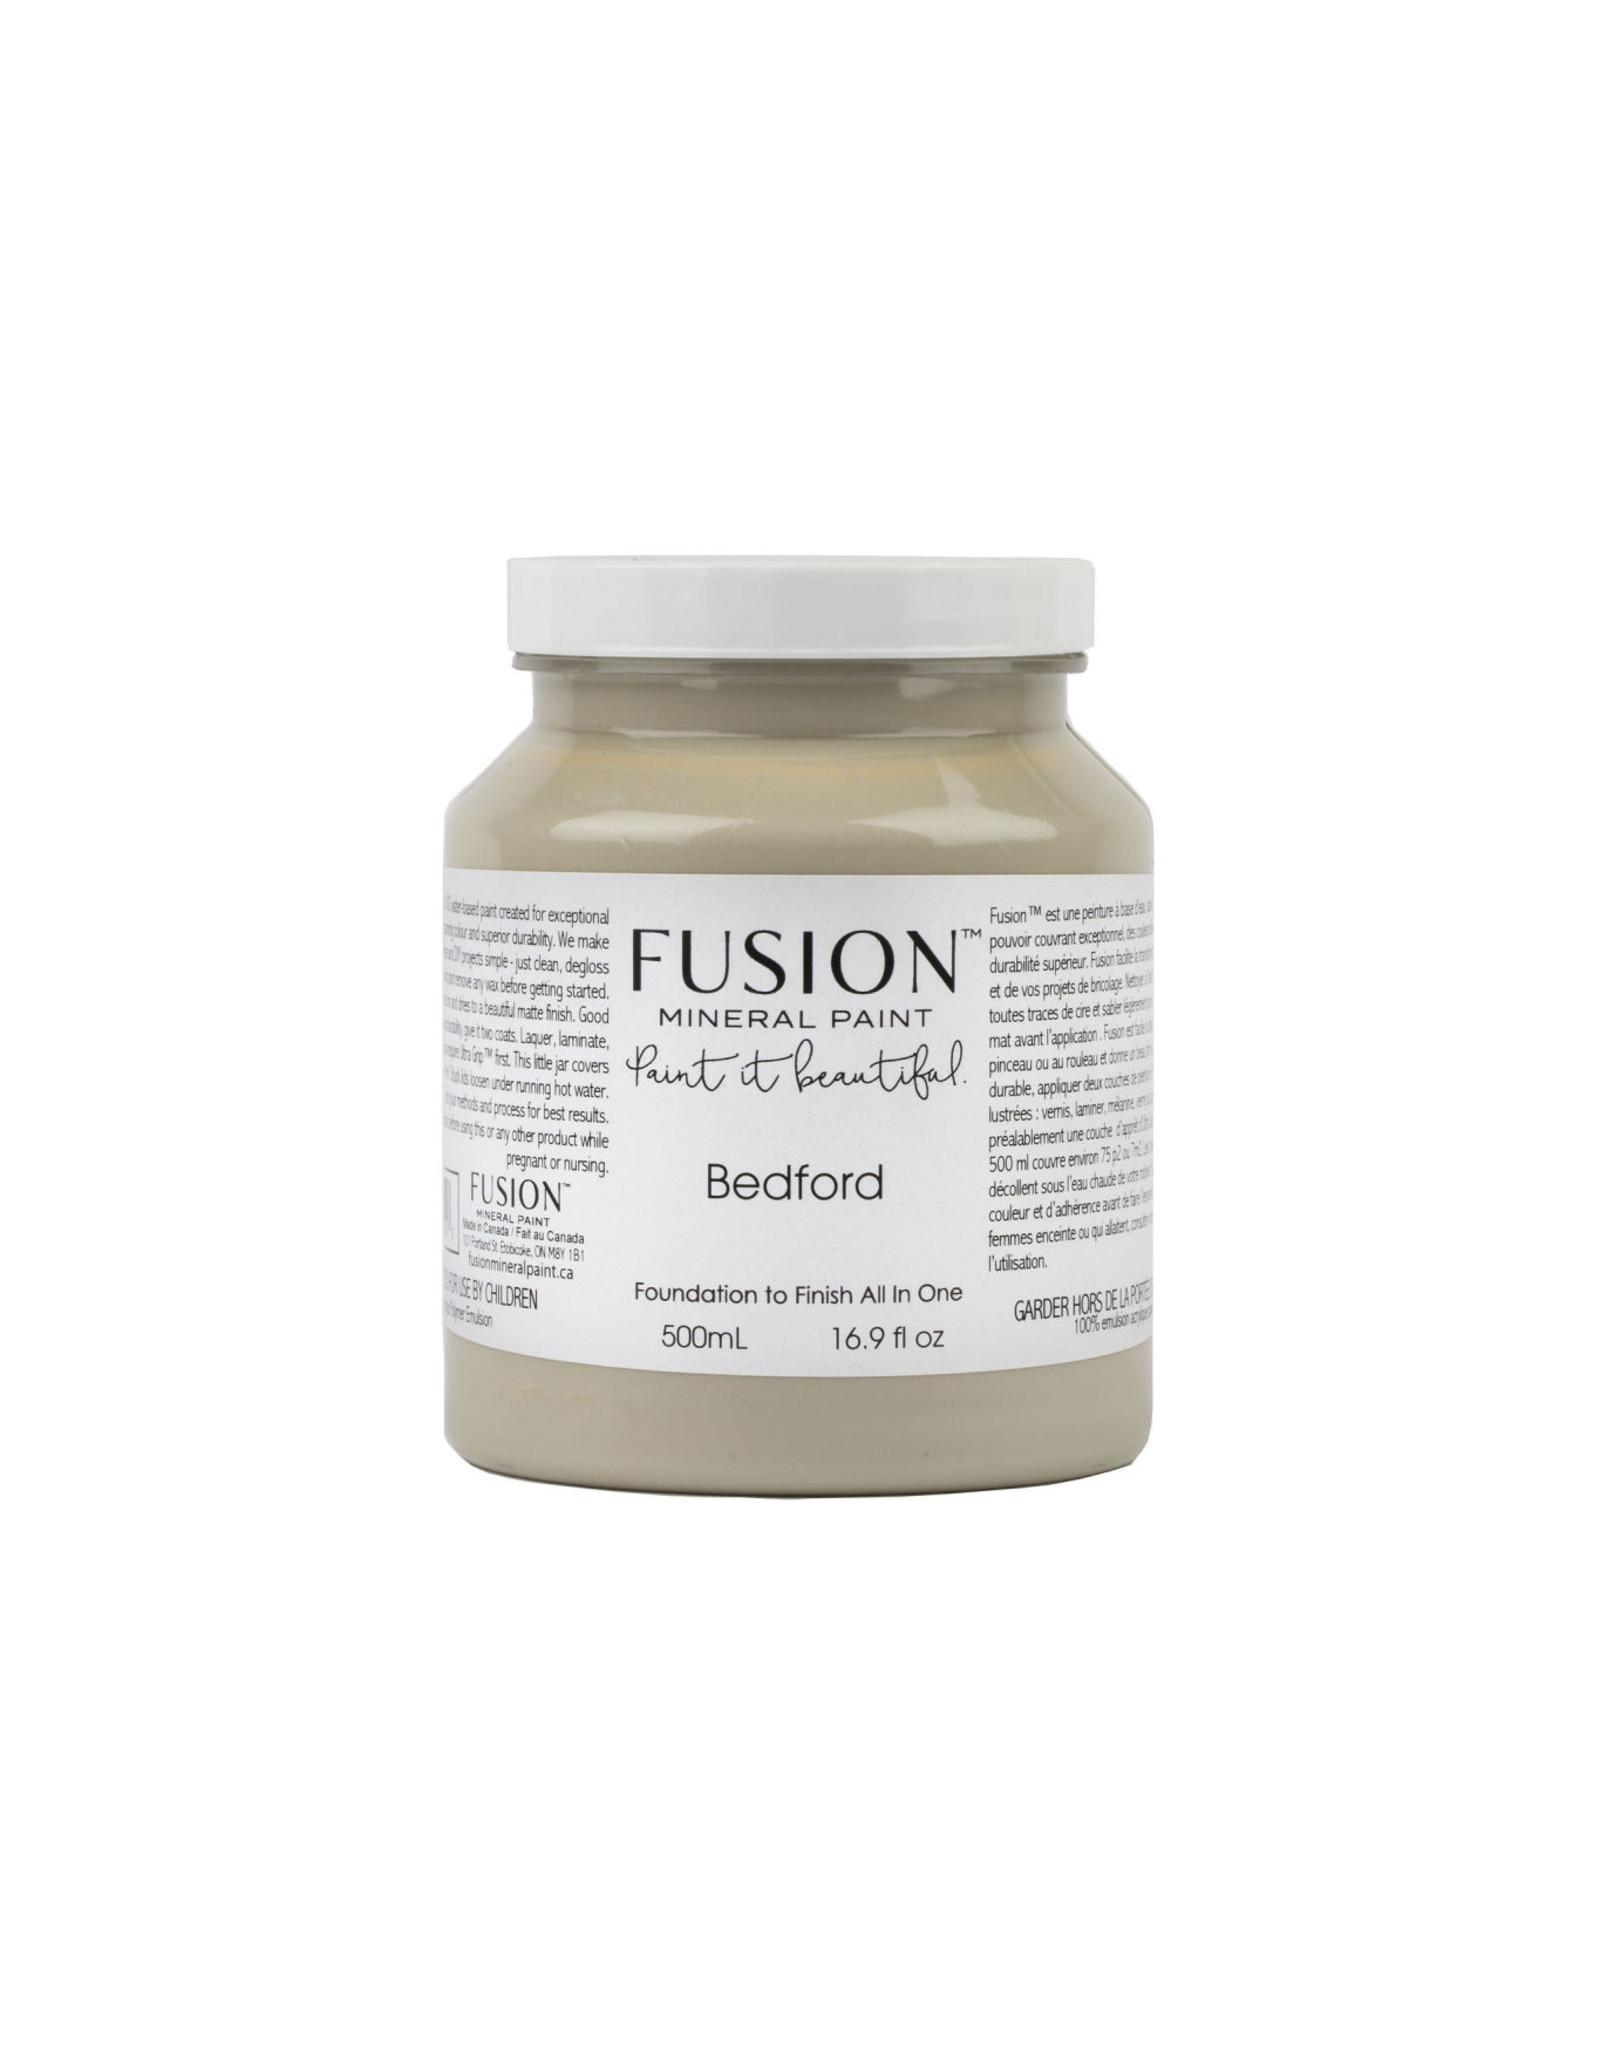 Fusion Mineral Paint Fusion Mineral Paint - Bedford 500ml